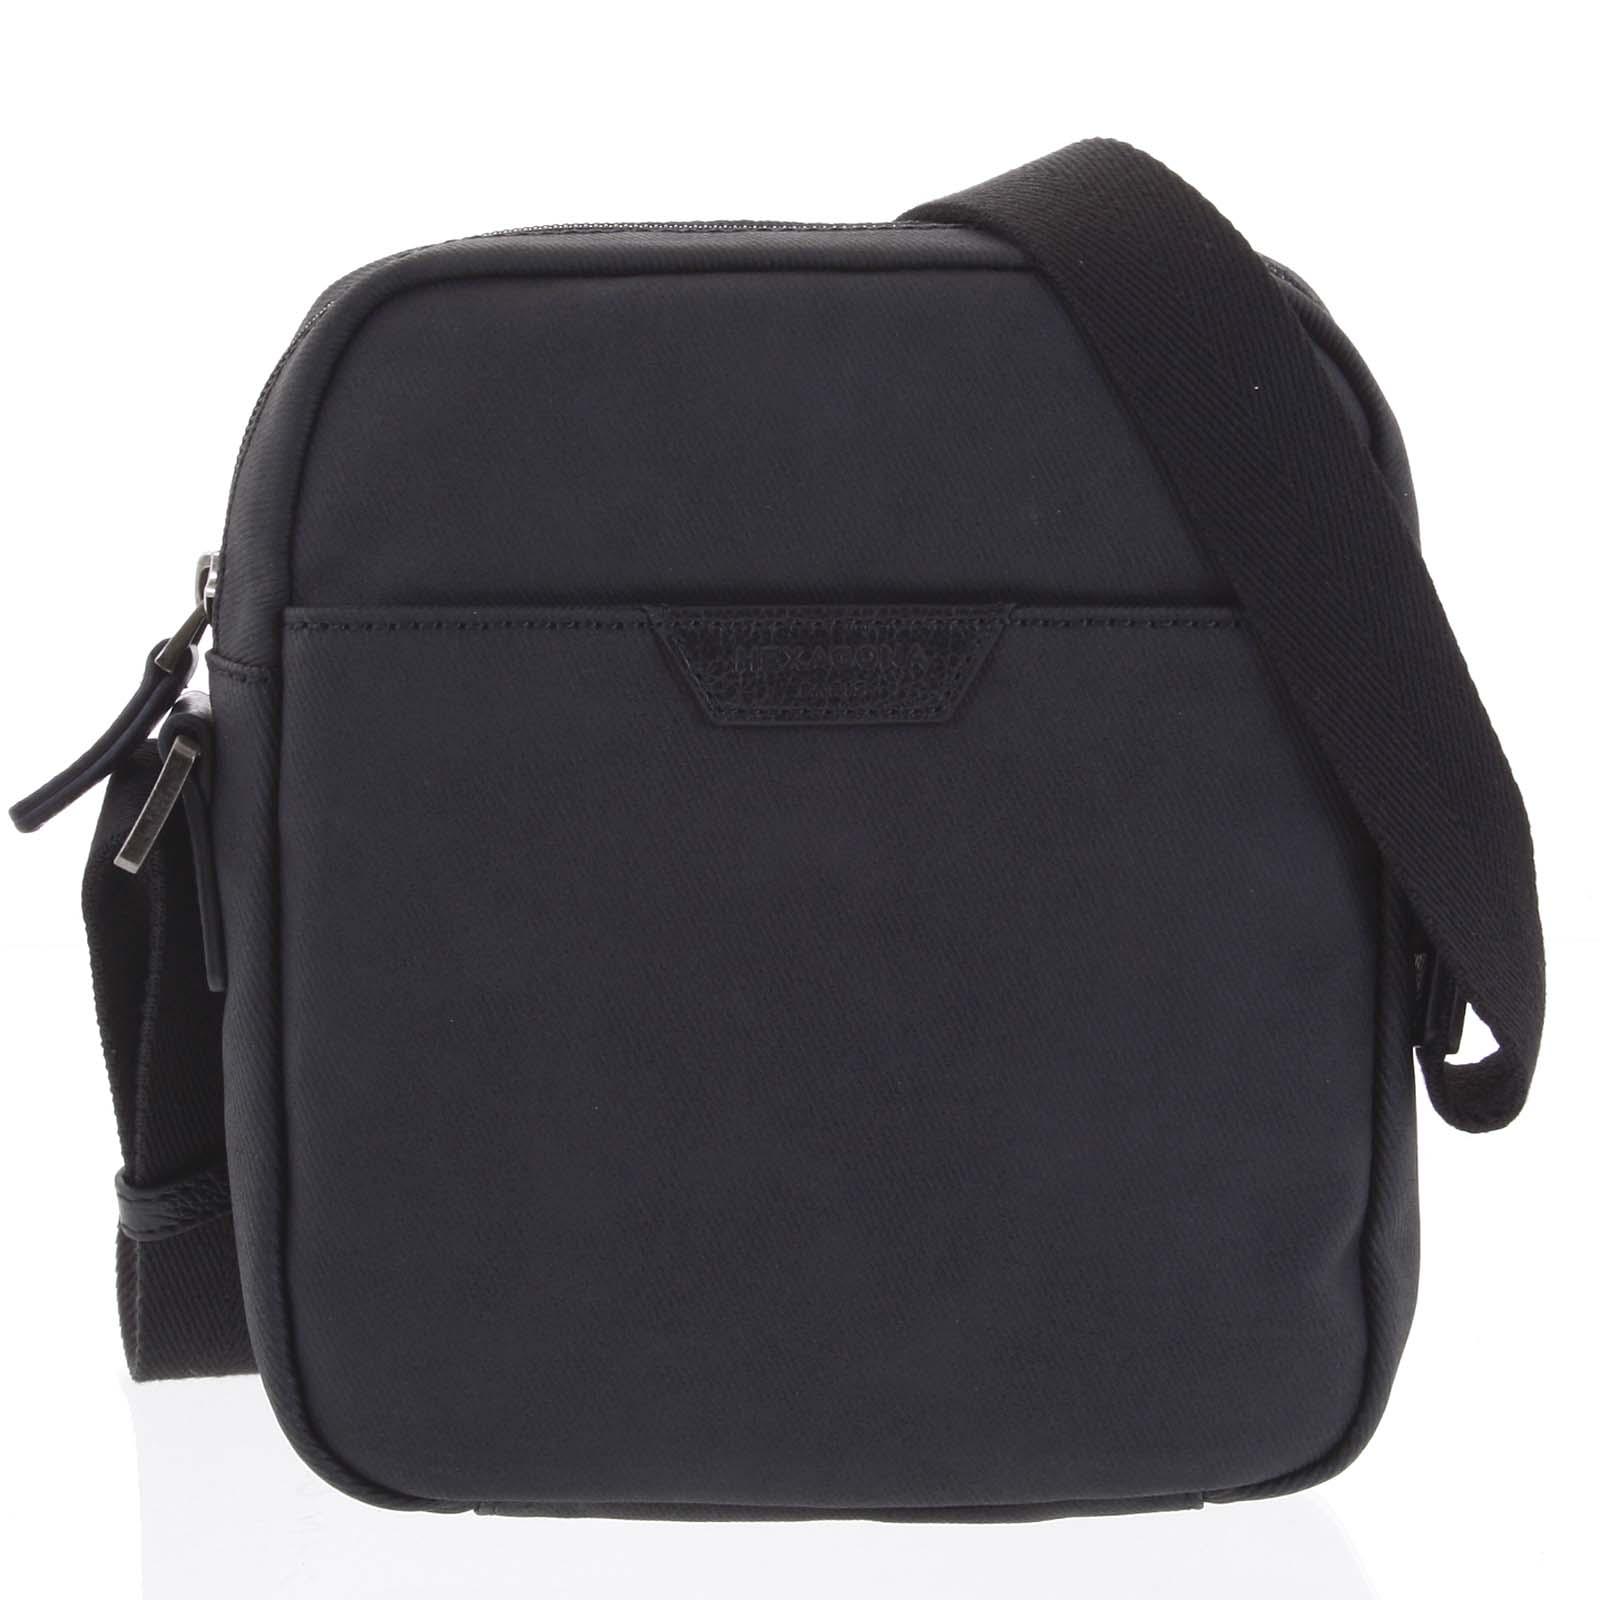 Pánska taška cez plece čierna - Hexagona Clark